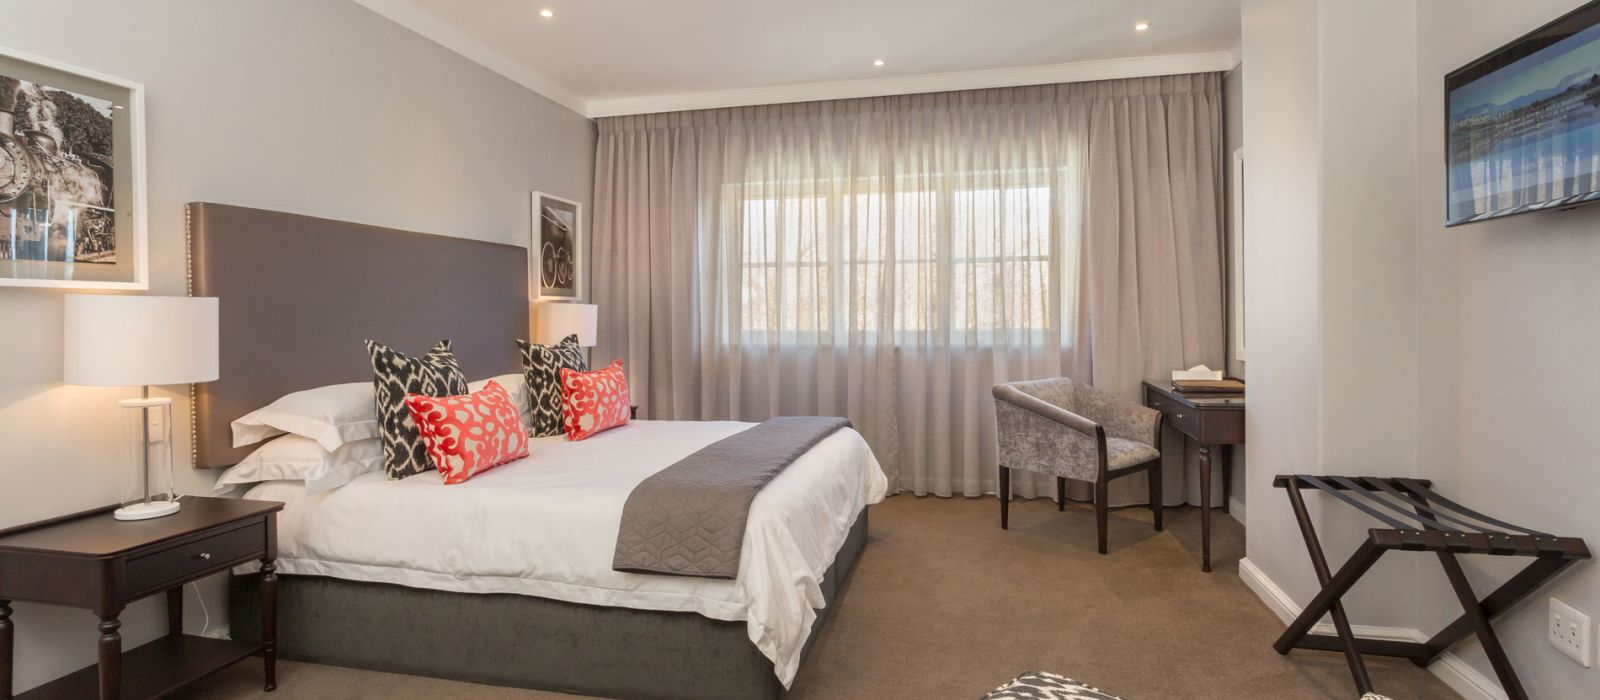 Fancourt Hotel Rooms